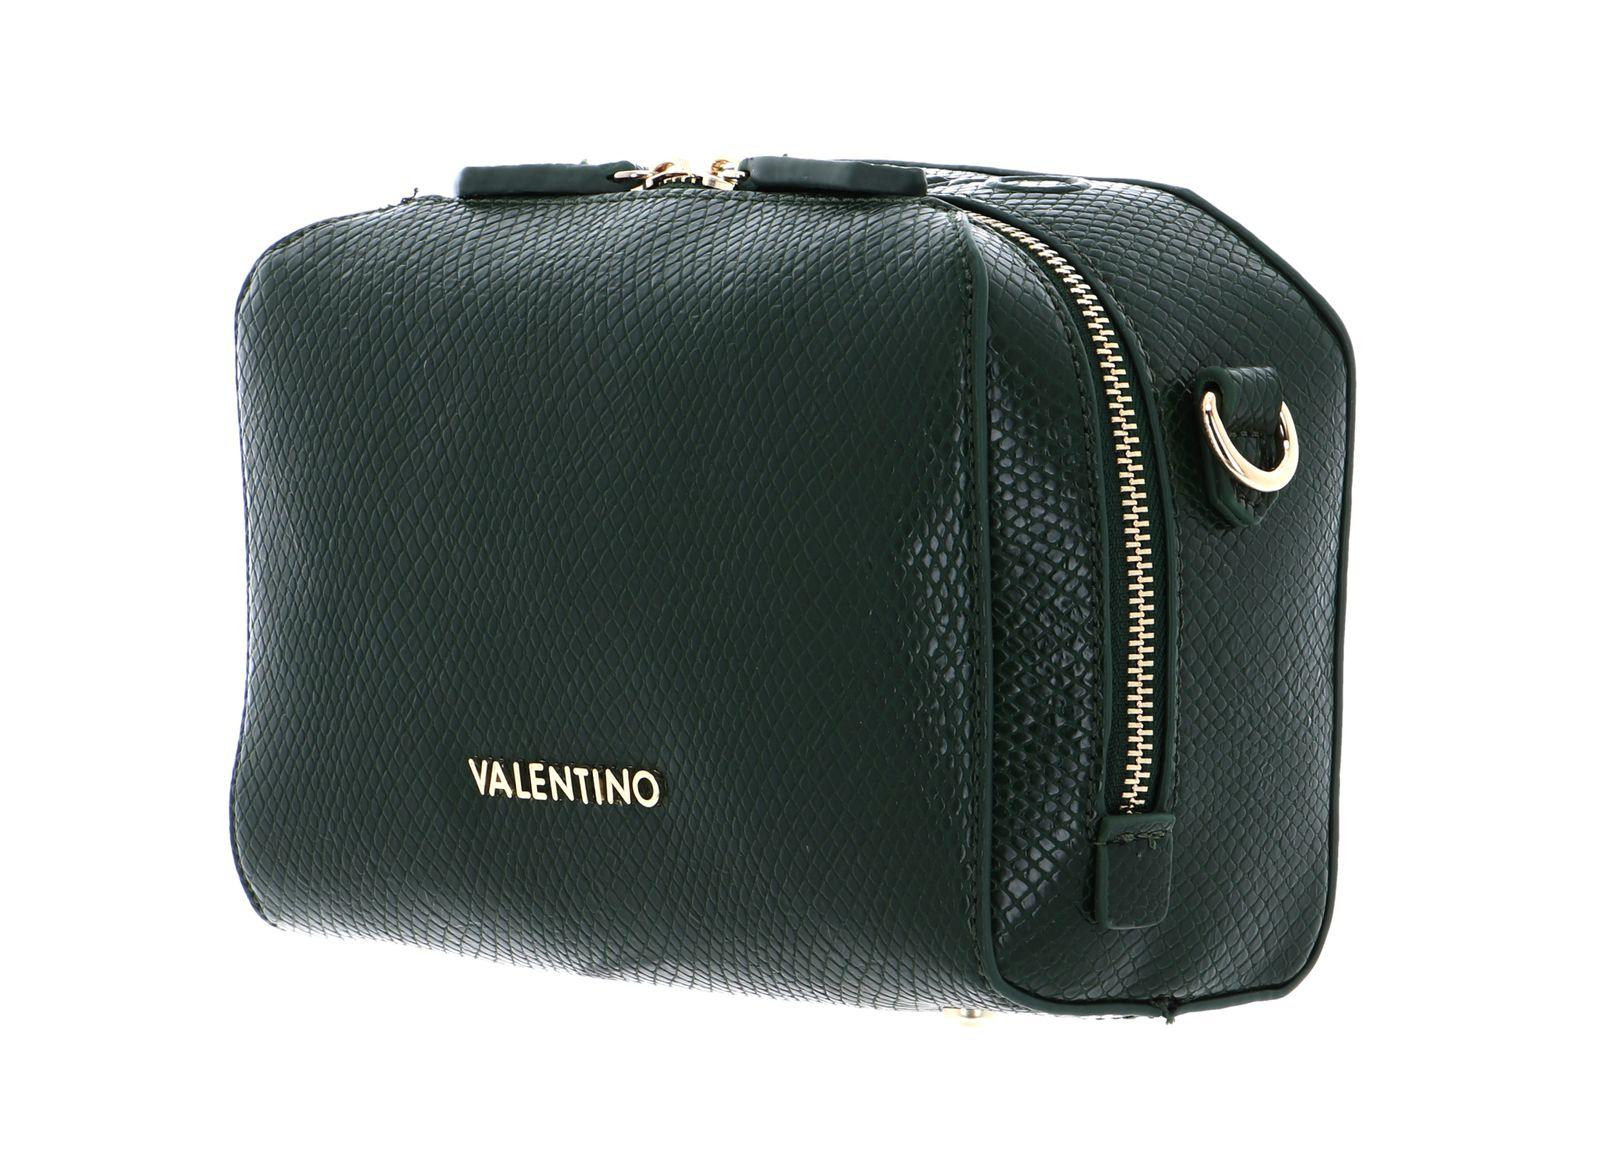 VALENTINO BAGS Pattie Crossover Bag Foresta / Multicolor